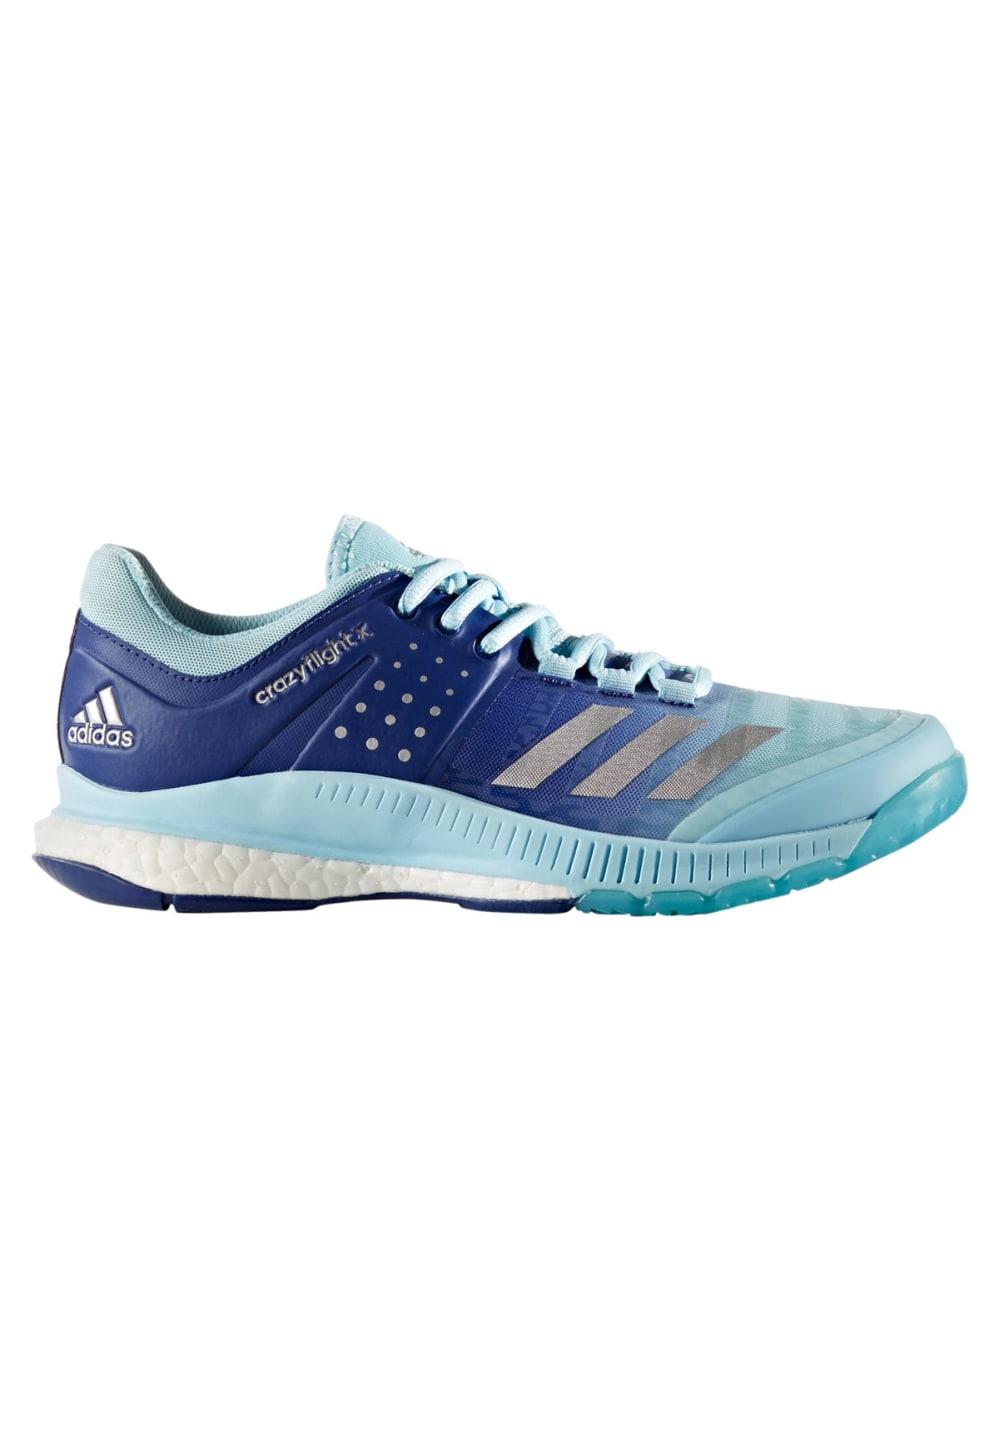 innovative design 46678 ff6b2 adidas Crazyflight X - Volleyball shoes for Women - Blue